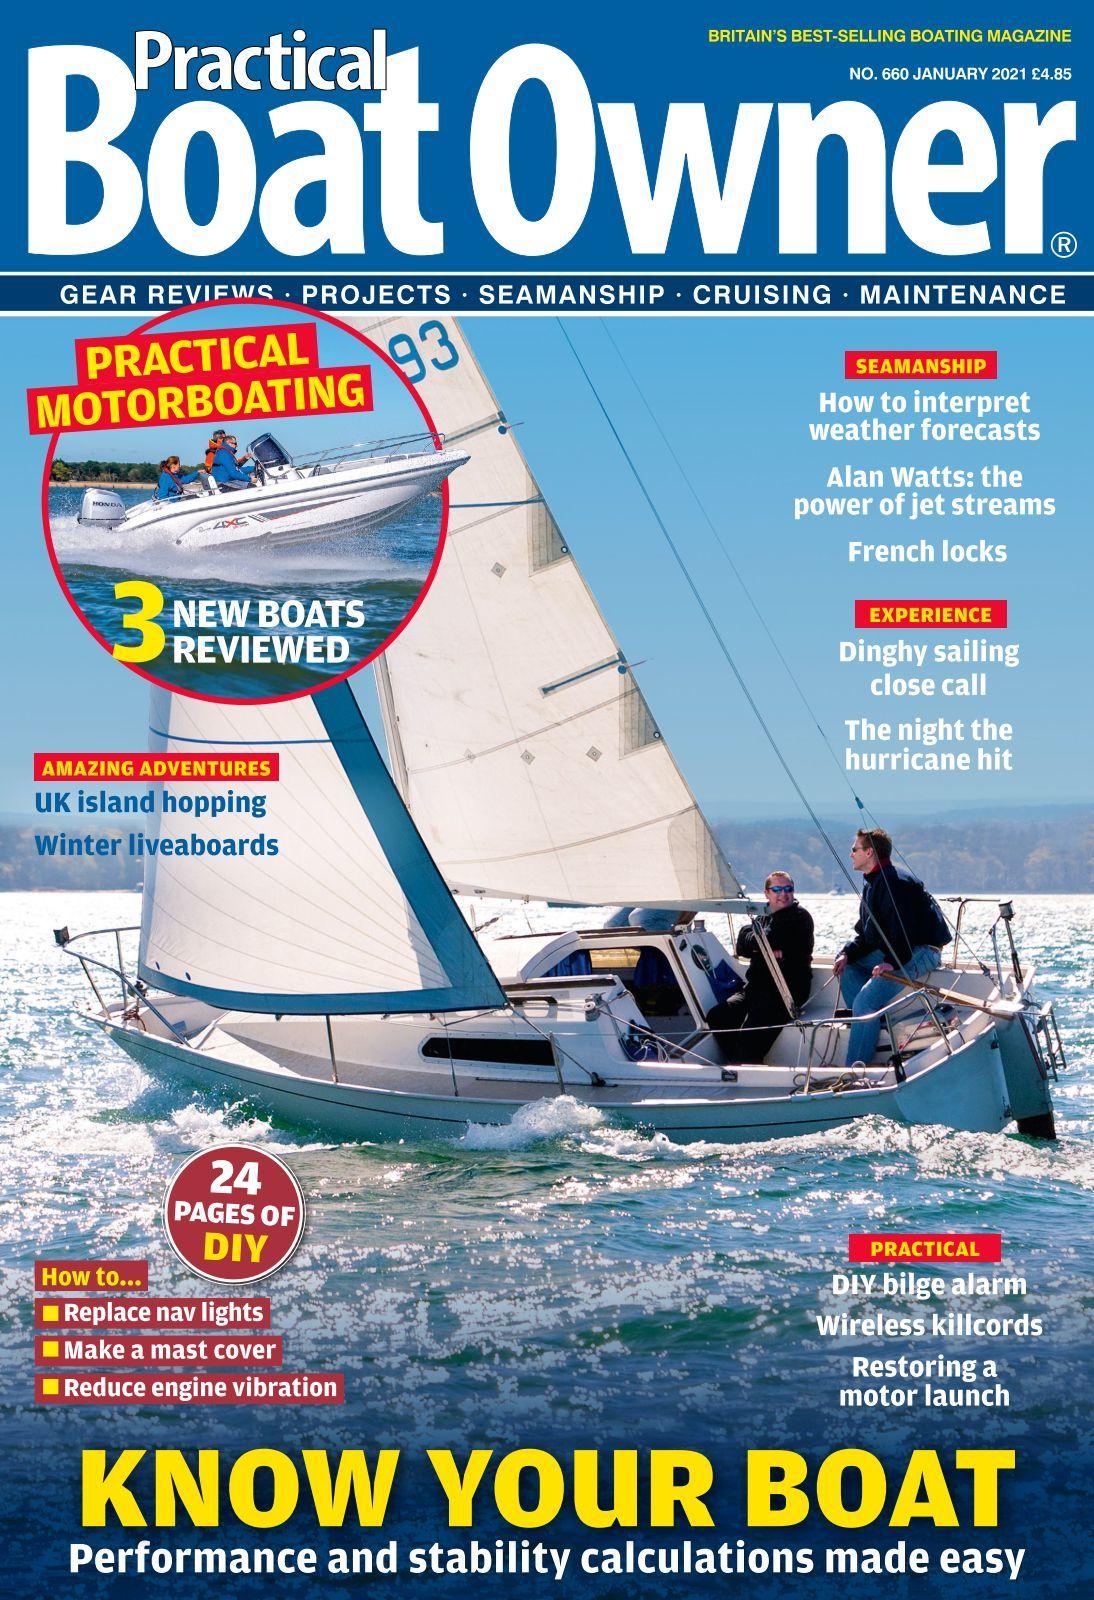 Power Living Drifting Socks Sea Anchor Rigging Sea Yacht//Sea Brake//Jet-ski//Yacht//Inflatable//Power Boat//Sailing 32 Inches Drifting Socks + 30 Feet Kayak Tow Line